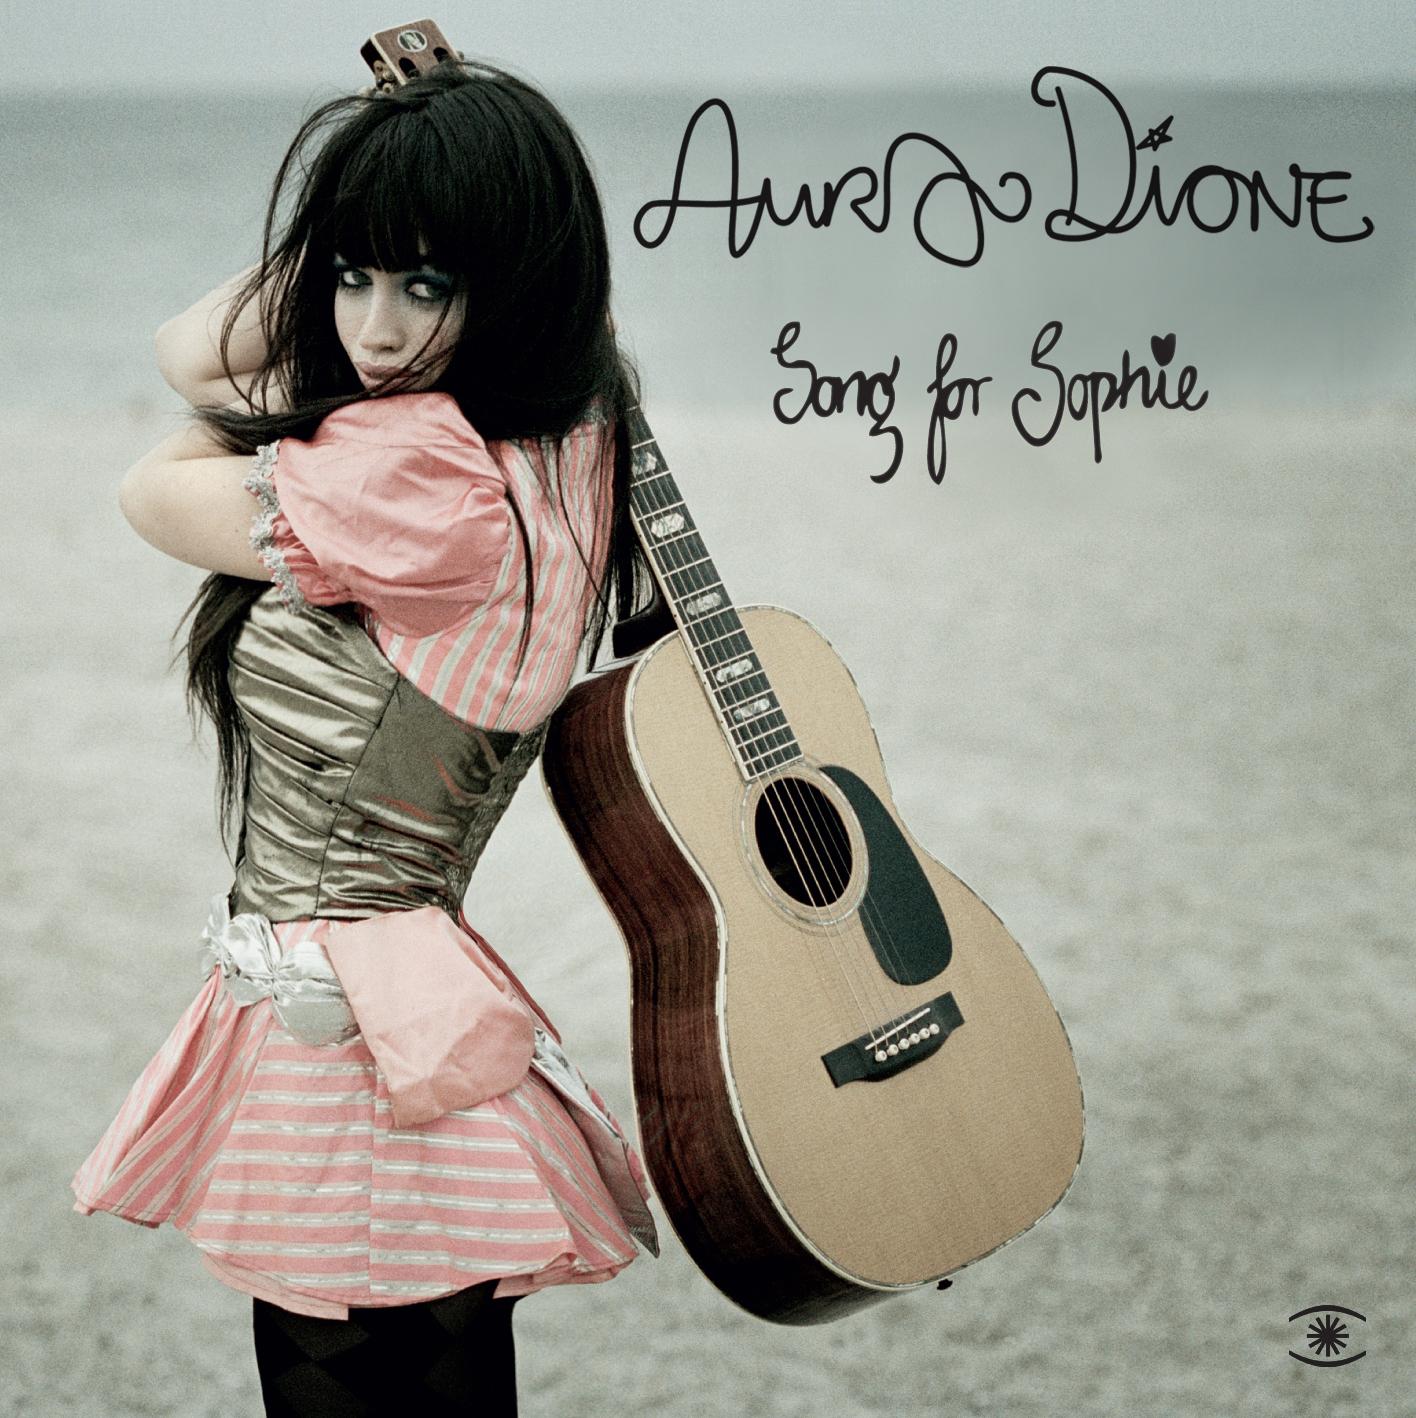 Aura dione singles